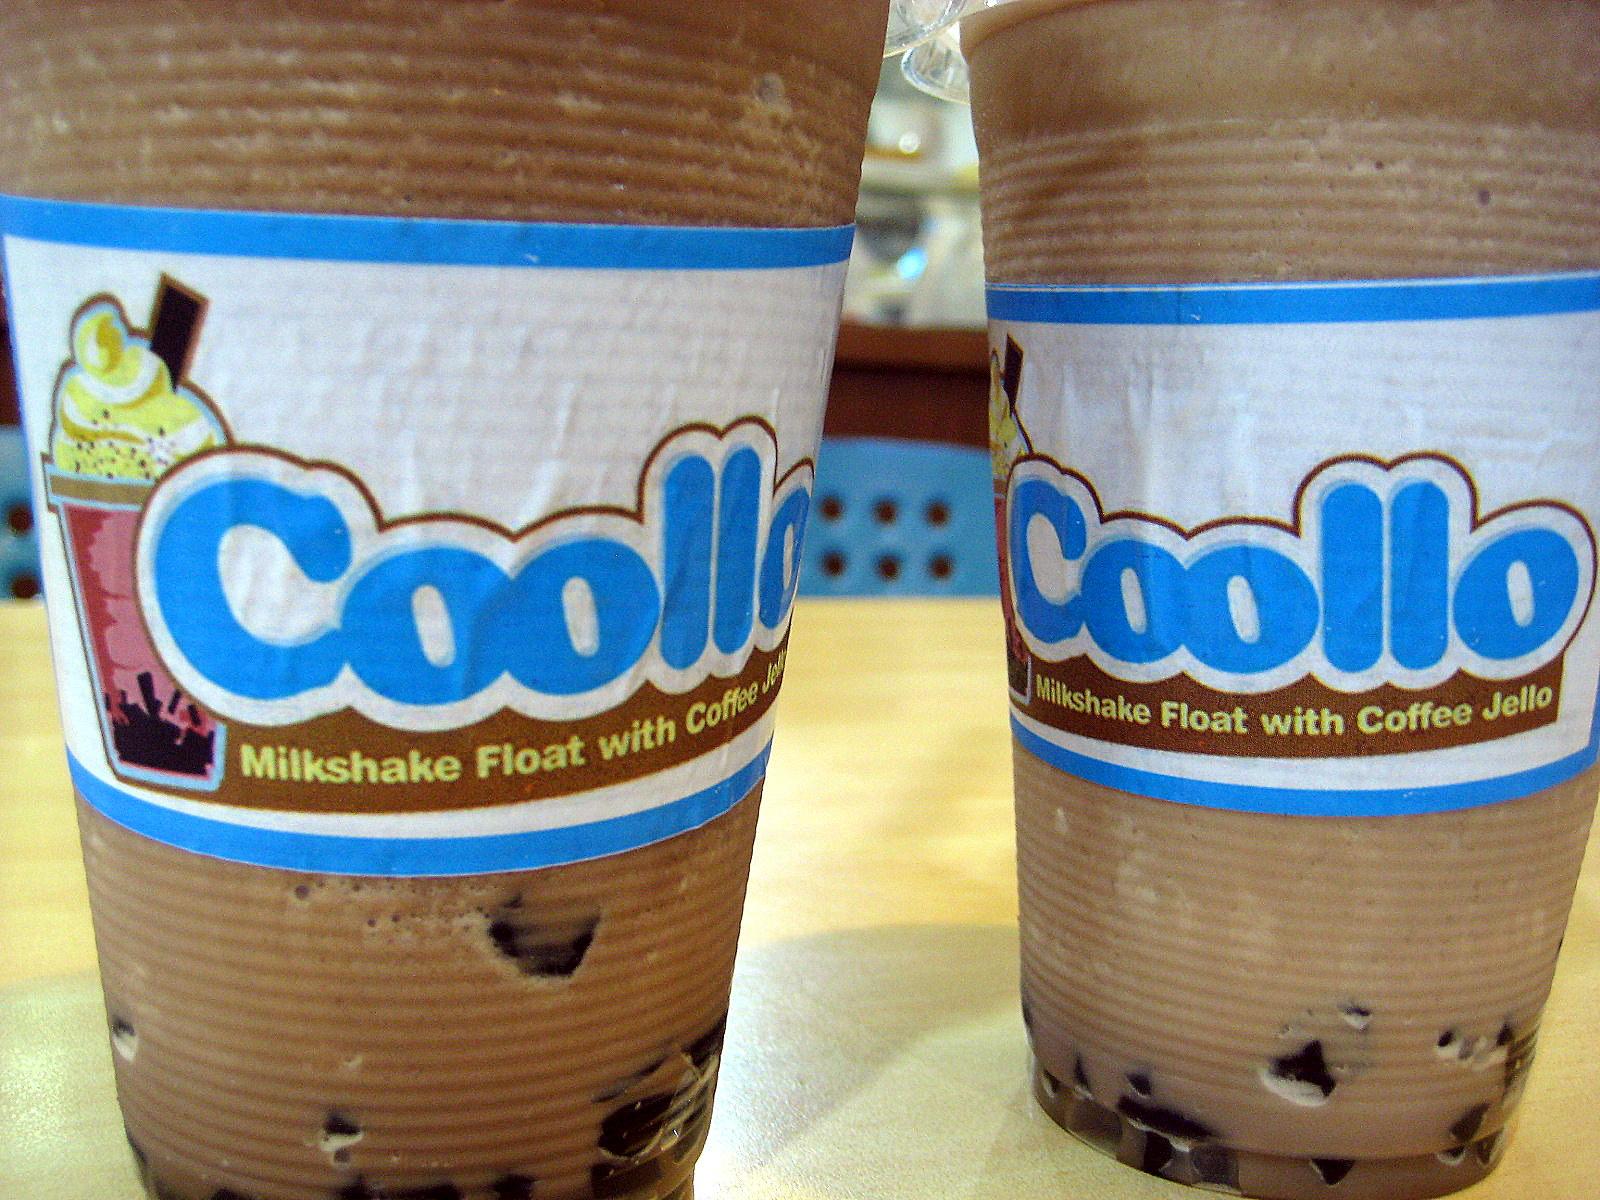 Coollo refreshing milkshake flavors: Dutch Choco and English Chocovanilla